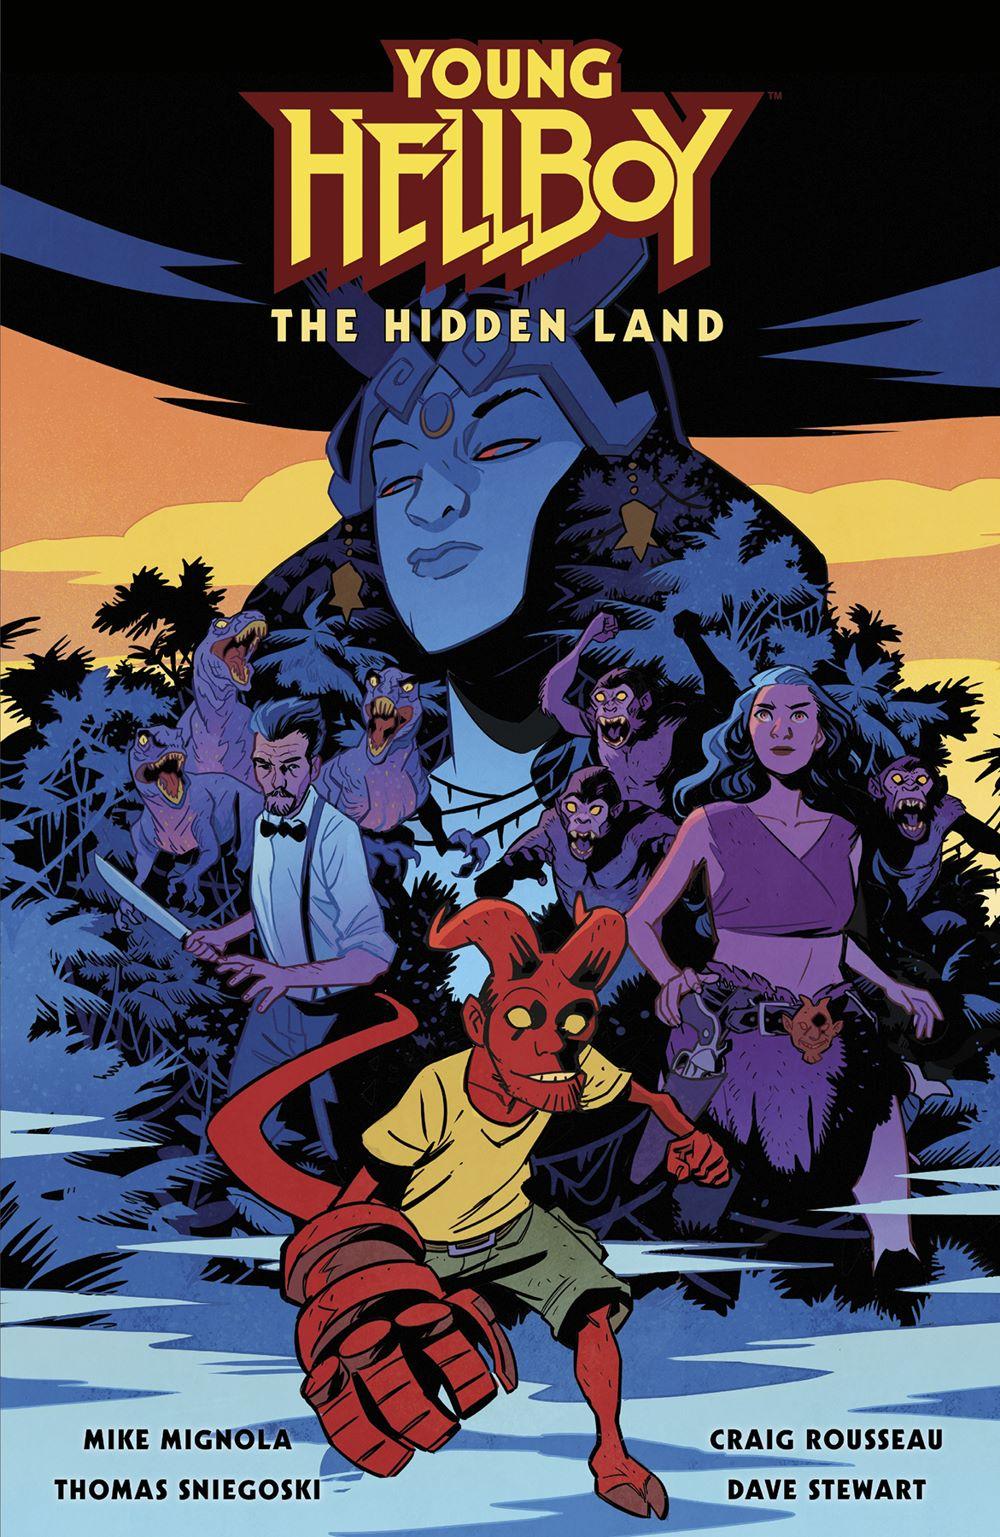 HBYYG_HC_CVR_4x6_SOL Dark Horse Comics July 2021 Solicitations